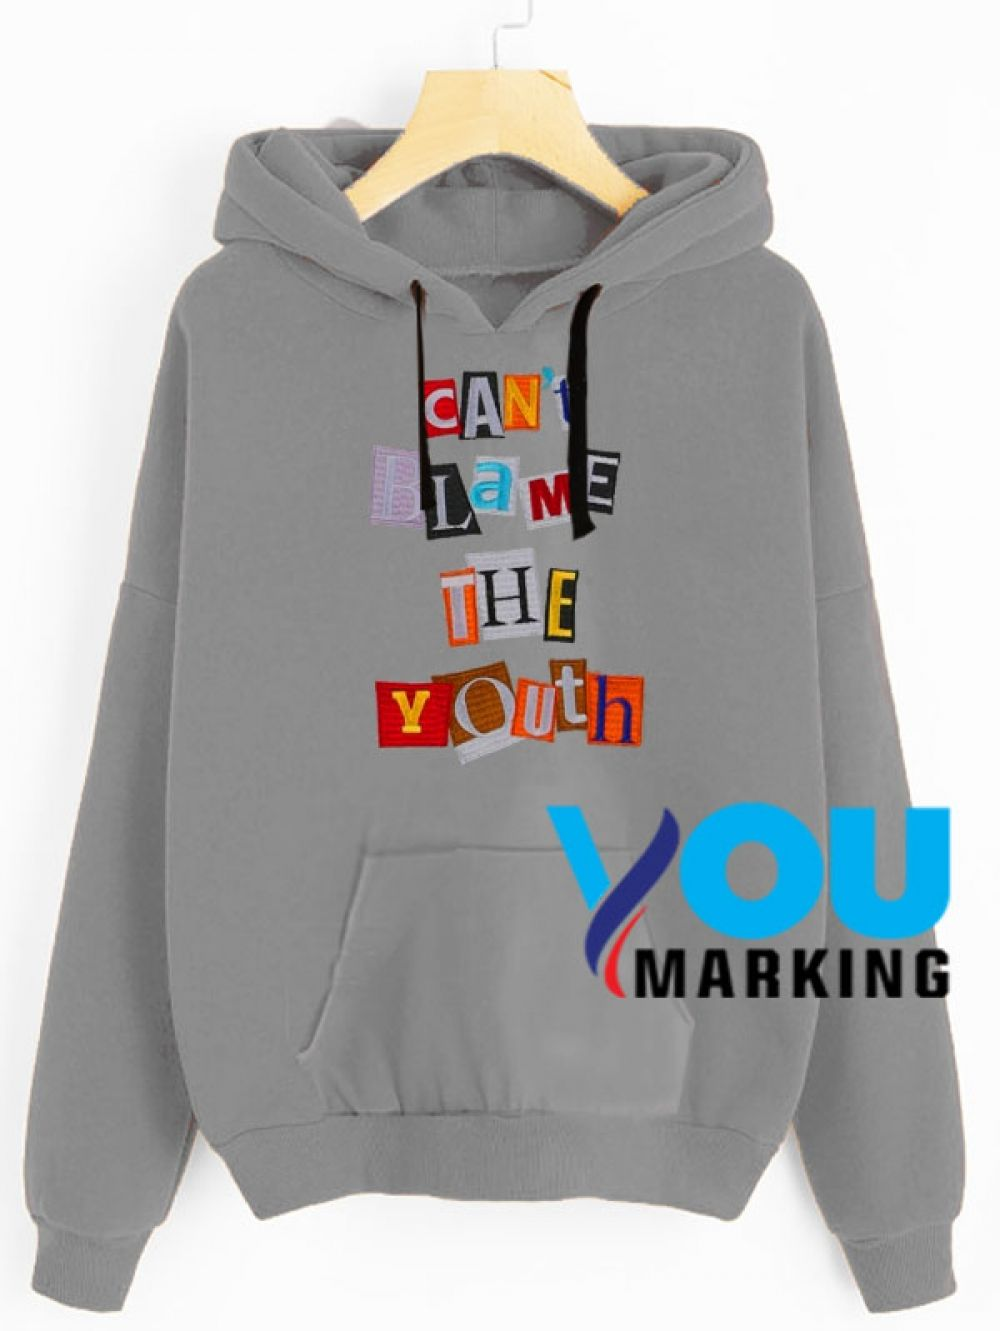 Graphic T Shirts Men Youmarking Hoodies Printed Hooded Sweatshirt Graphic Hoodies [ 1331 x 1000 Pixel ]